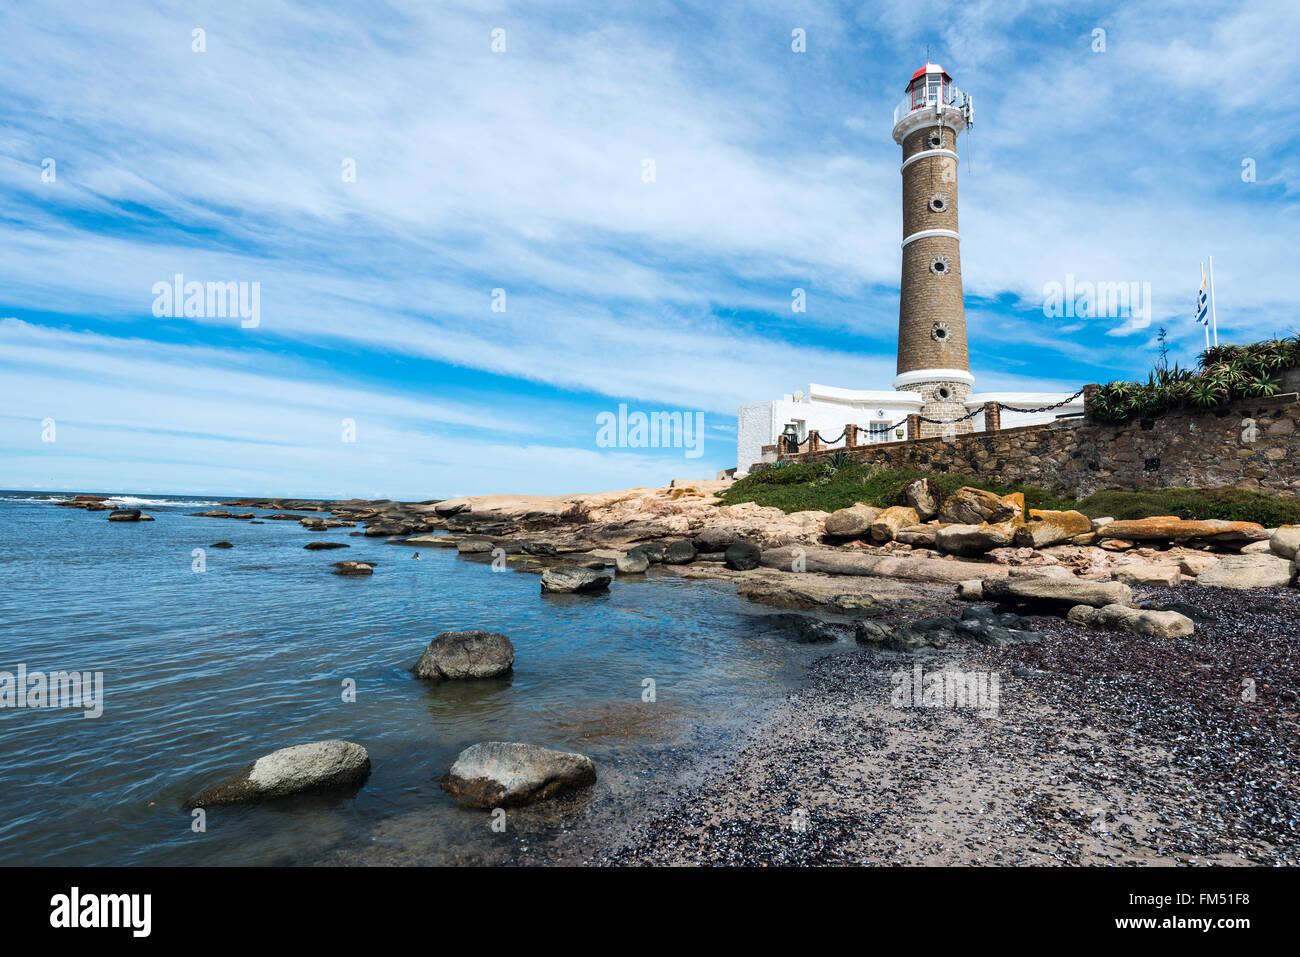 Lighthouse in Jose Ignacio near Punta del Este, Uruguay - Stock Image